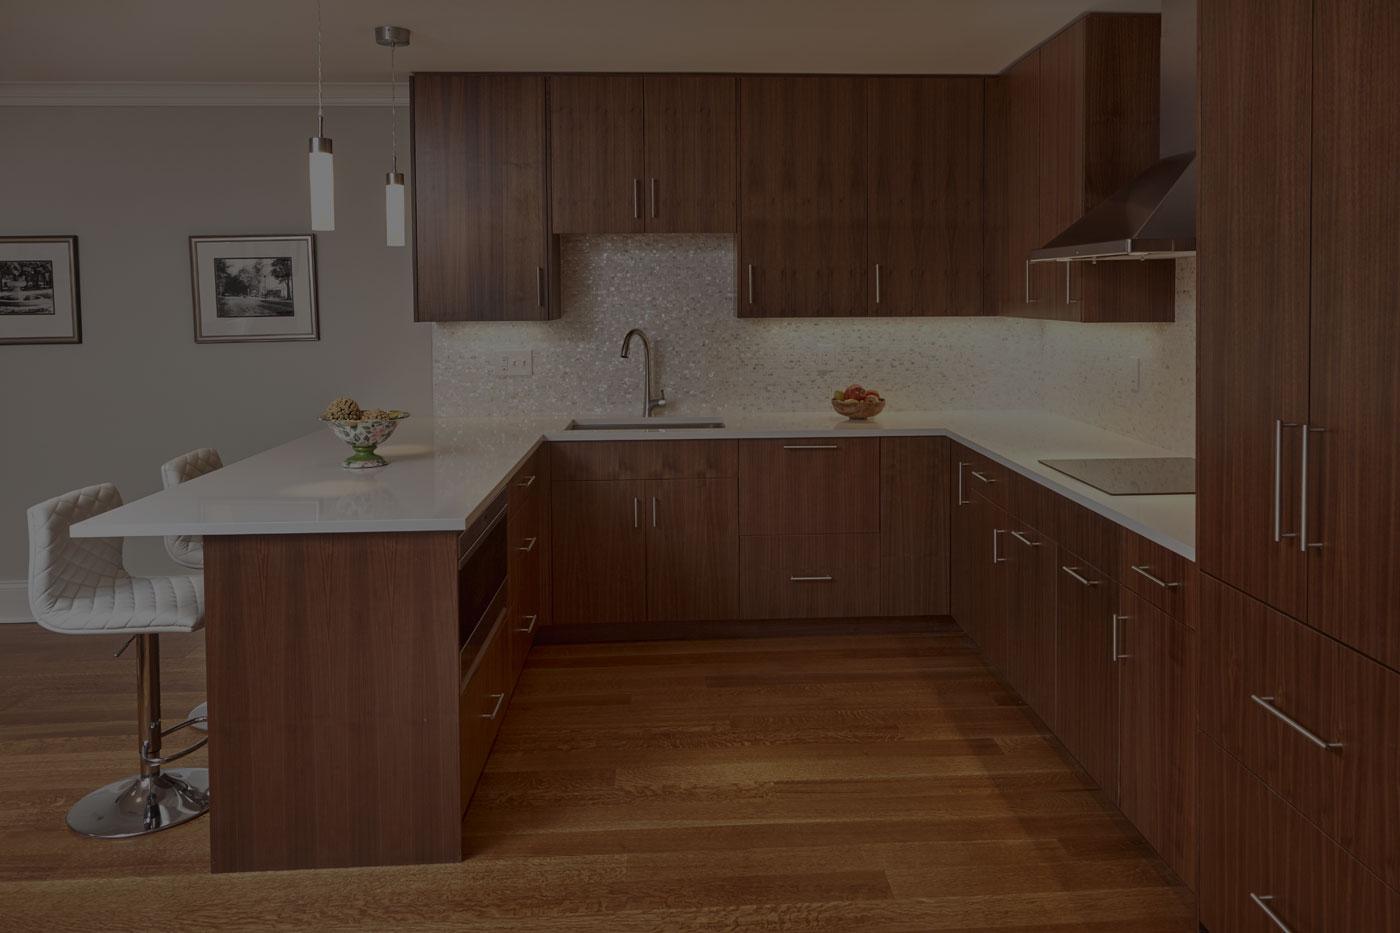 Home maria matluck construction consultants - Kitchen design consultants ...